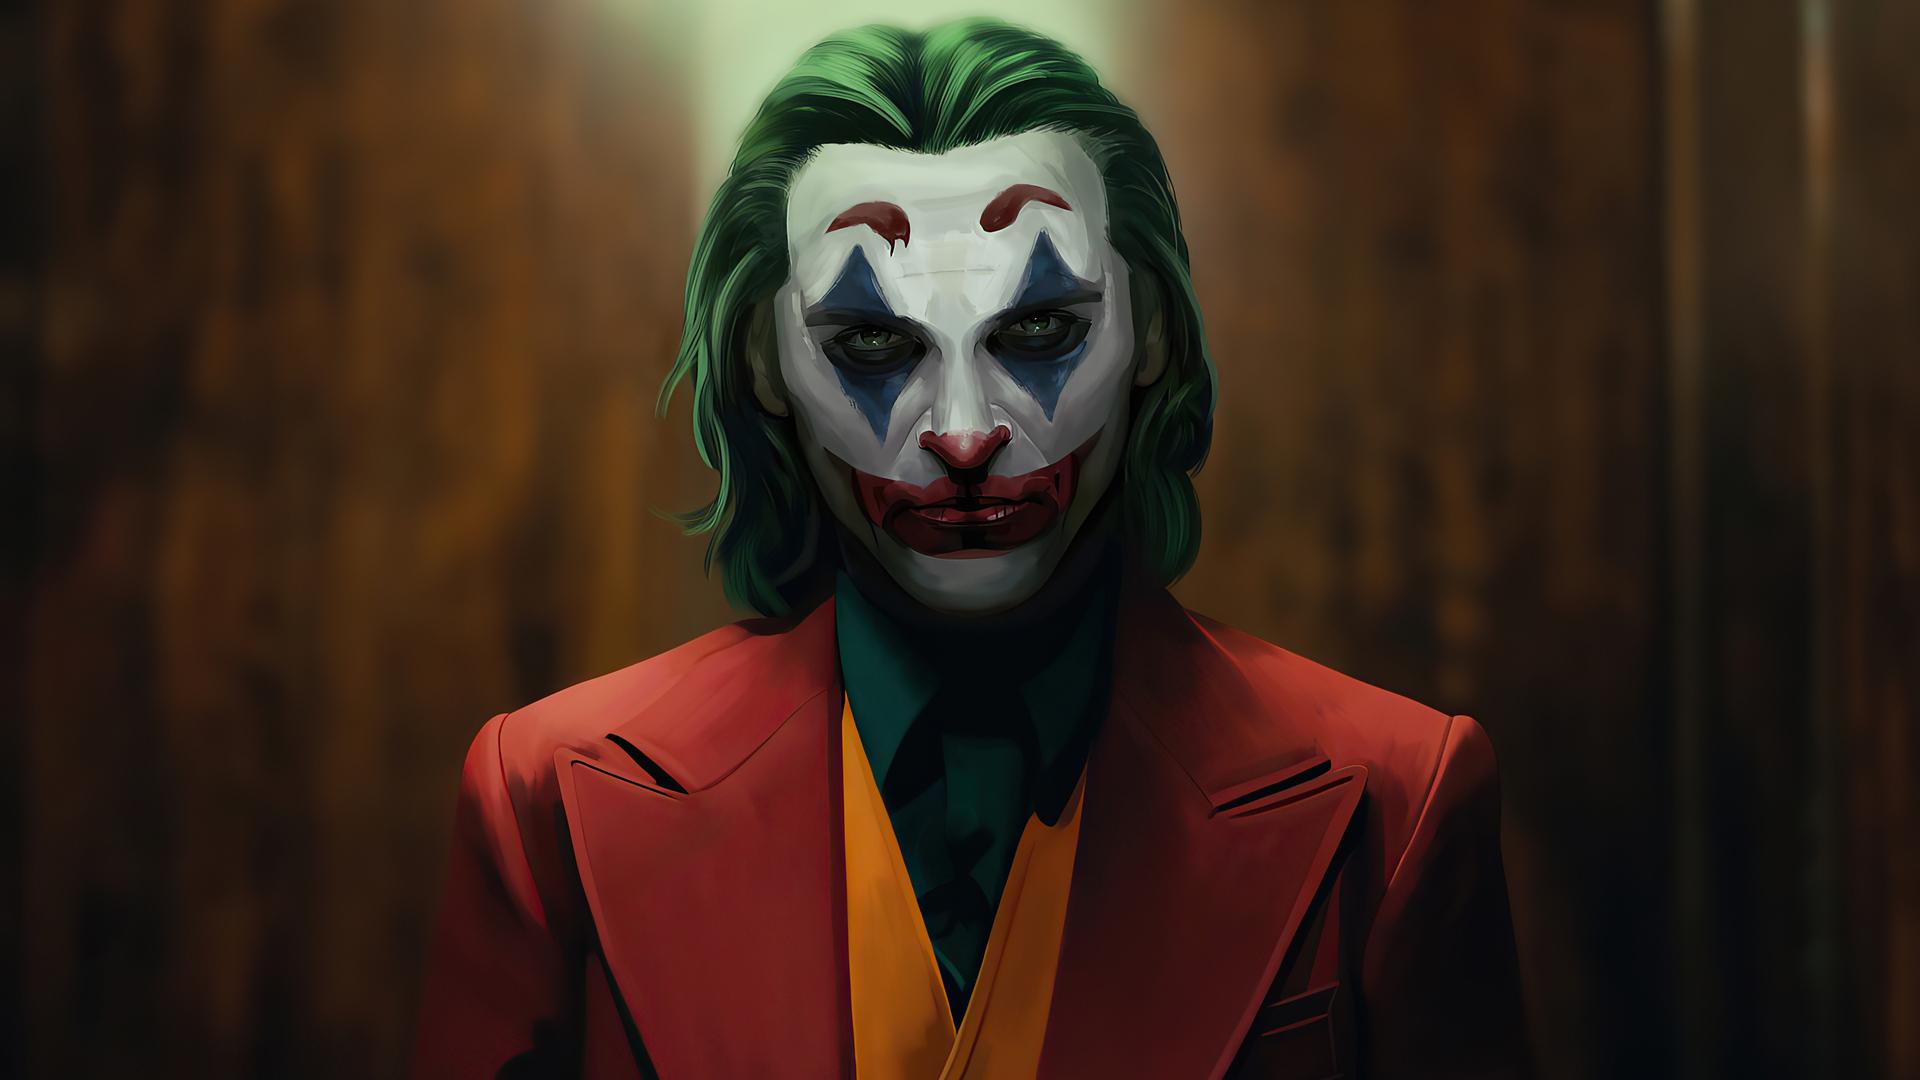 joker-sketch-artwork-2020-qi.jpg